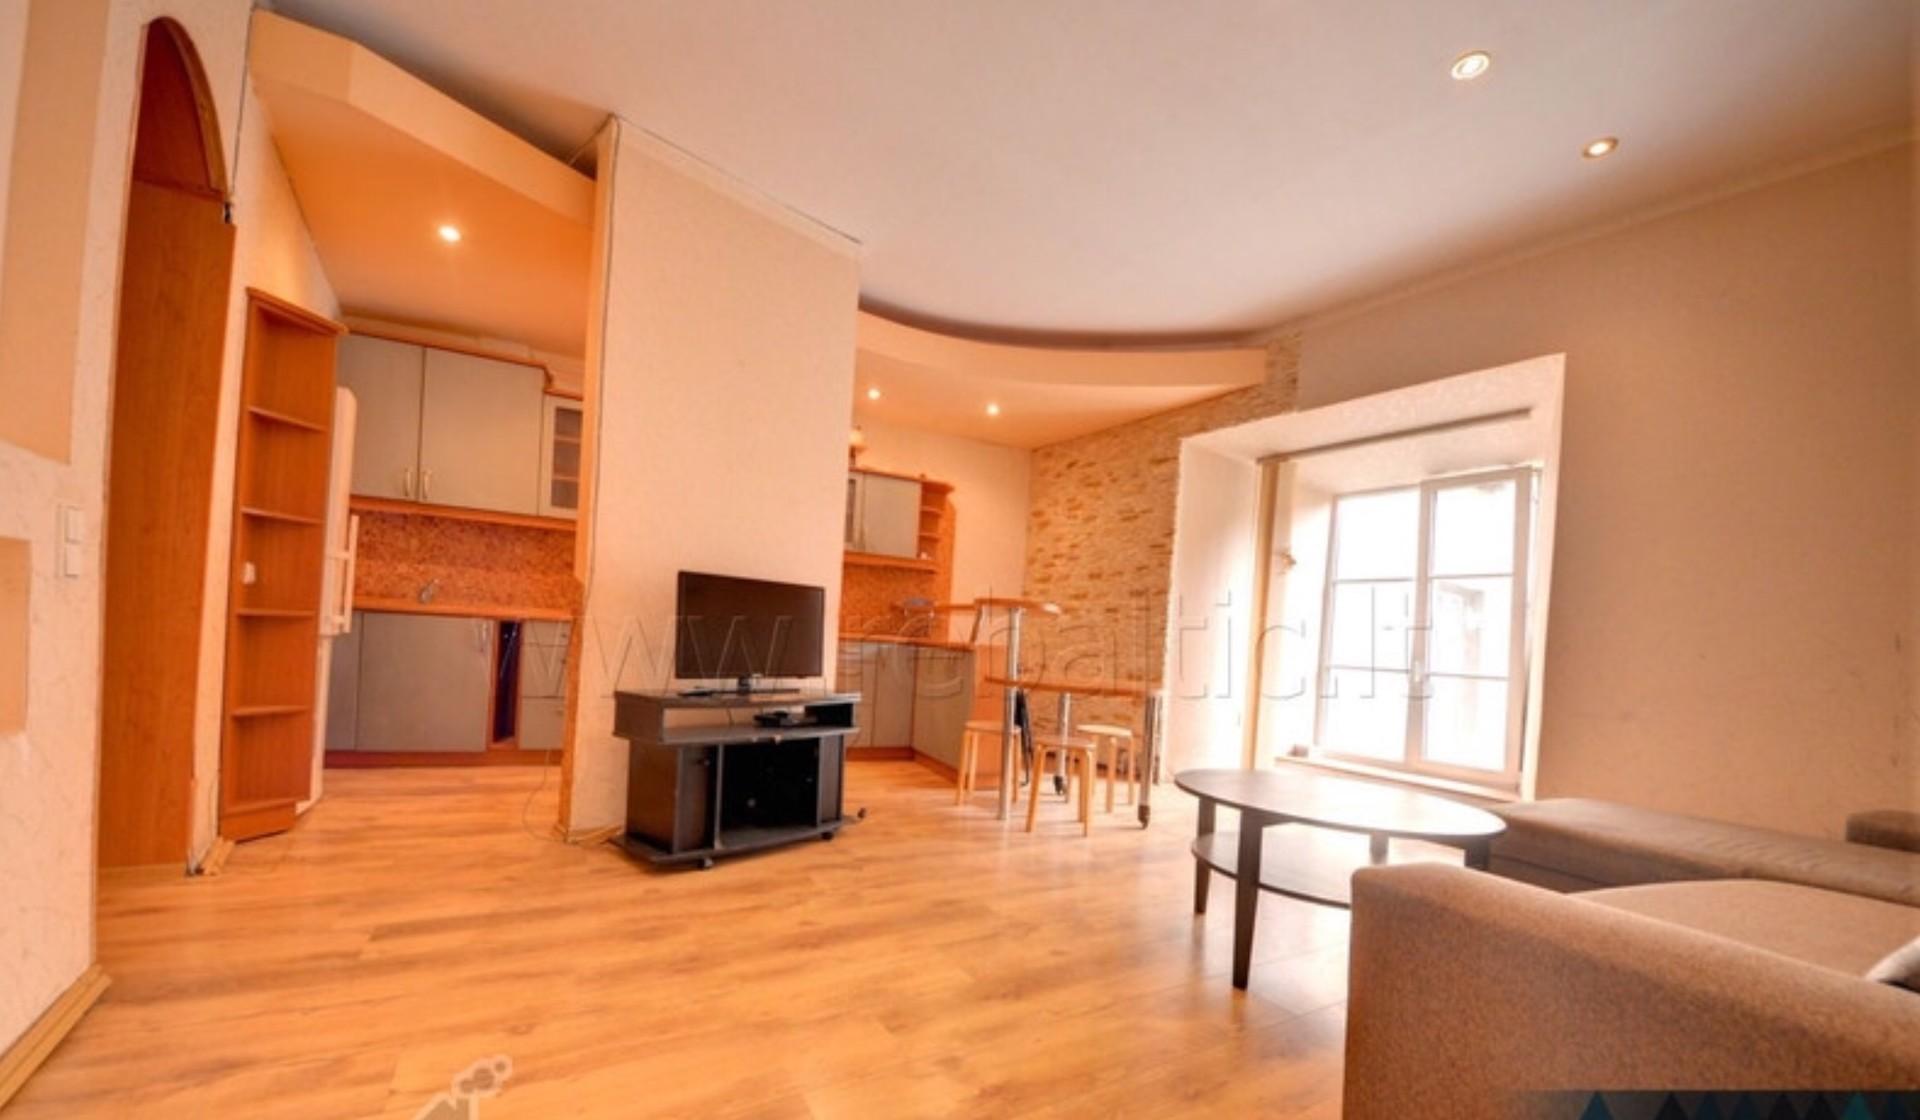 spacious-apartment-center-old-town-vilnius-350019d47212603ae0992e9fc69bed3a